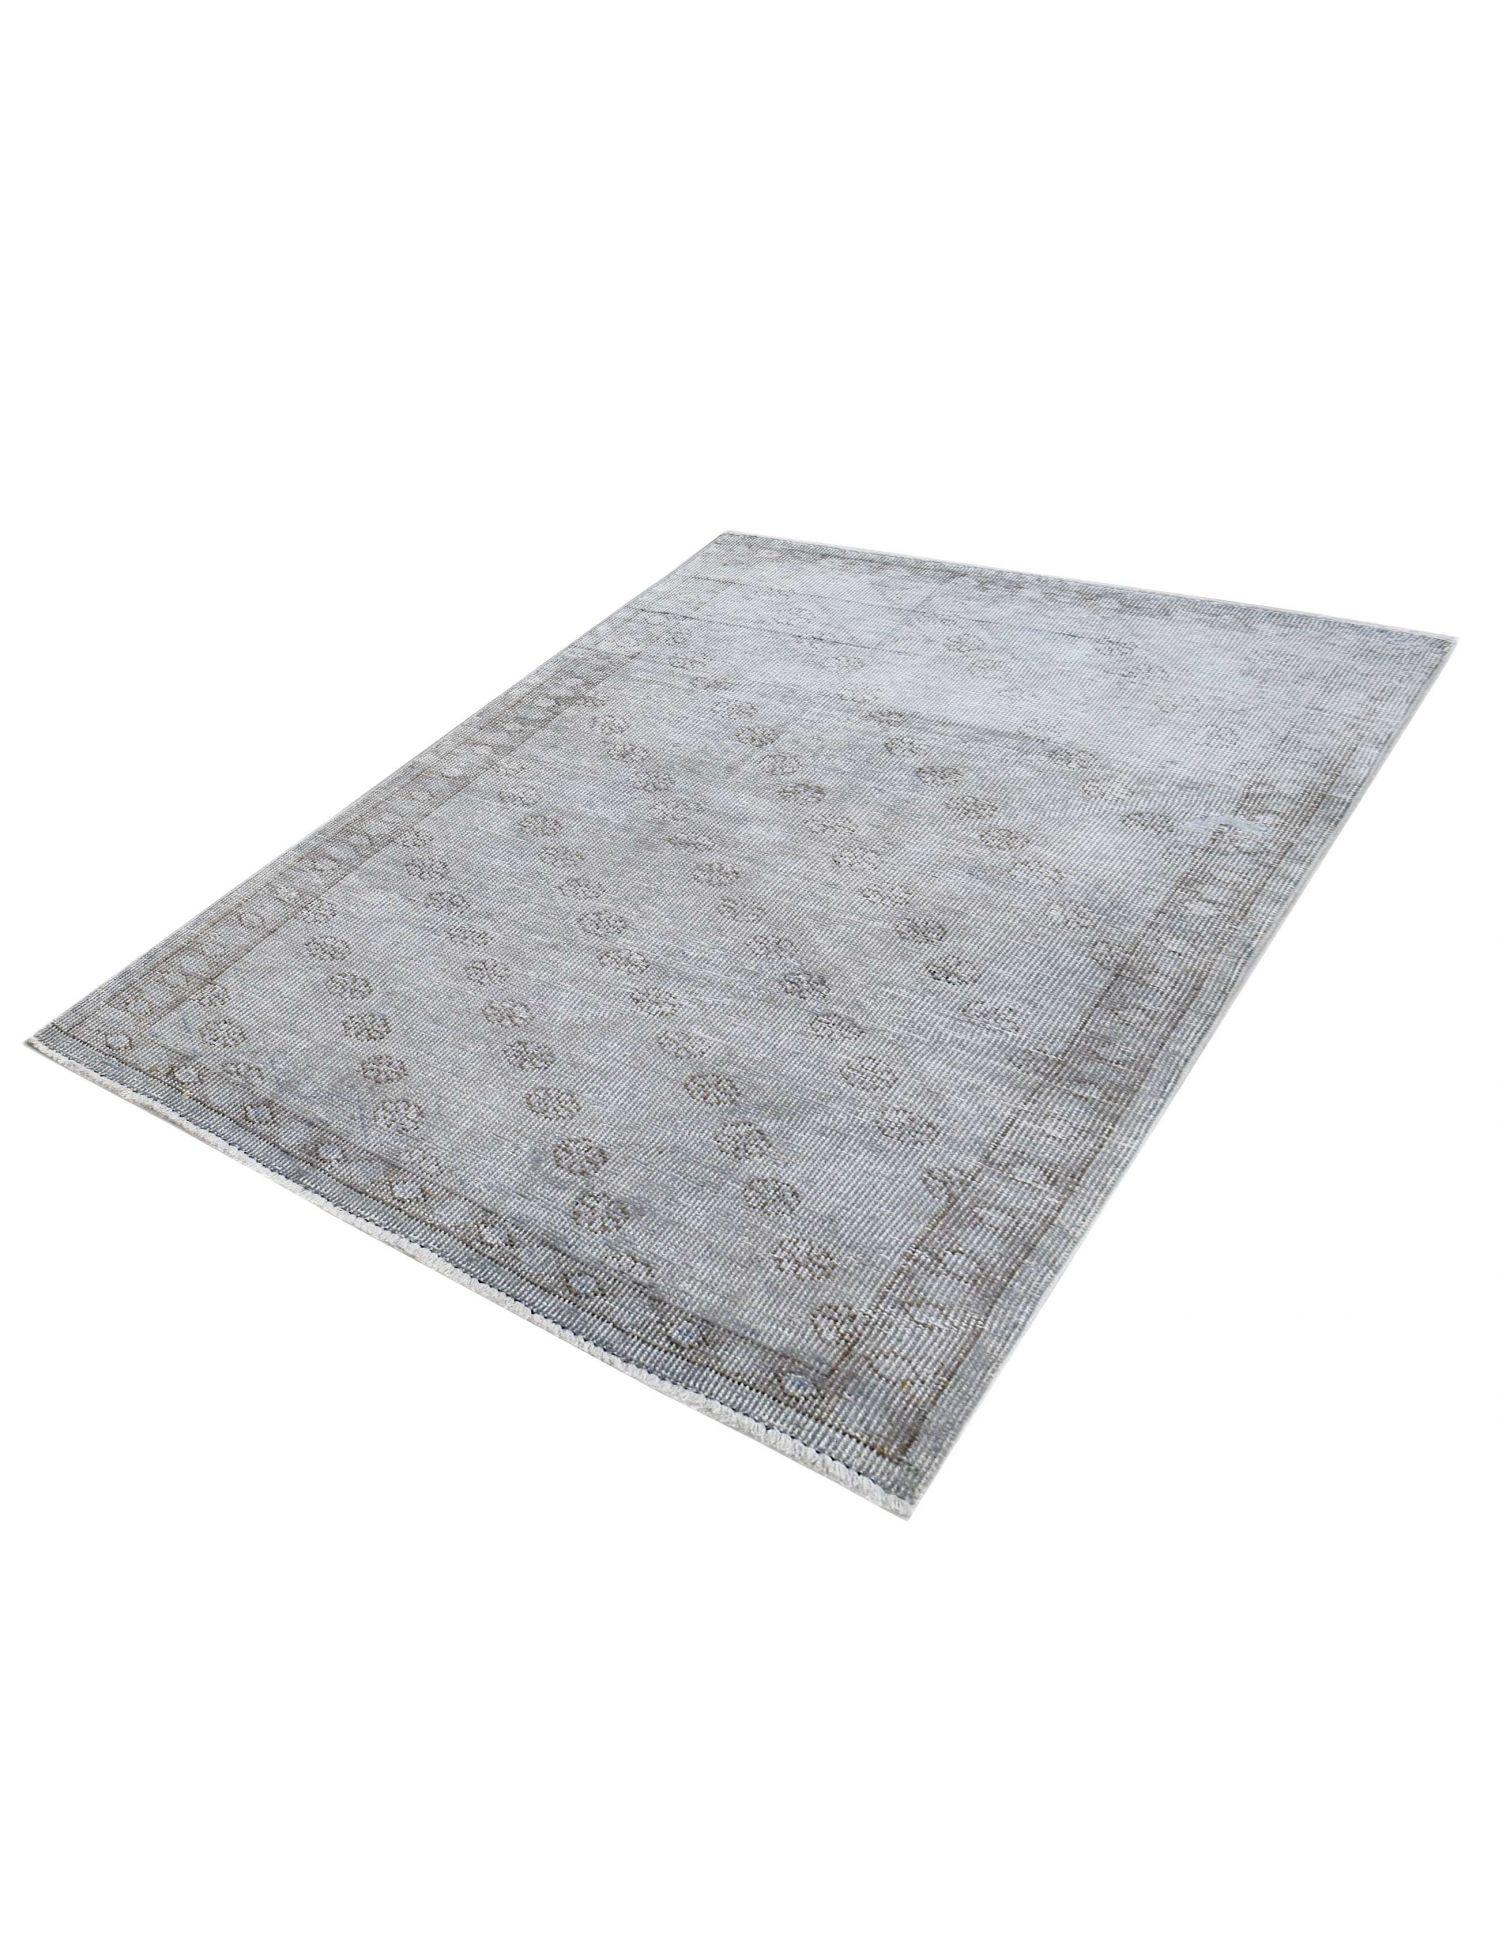 Vintage Perserteppich  grau <br/>138 x 92 cm